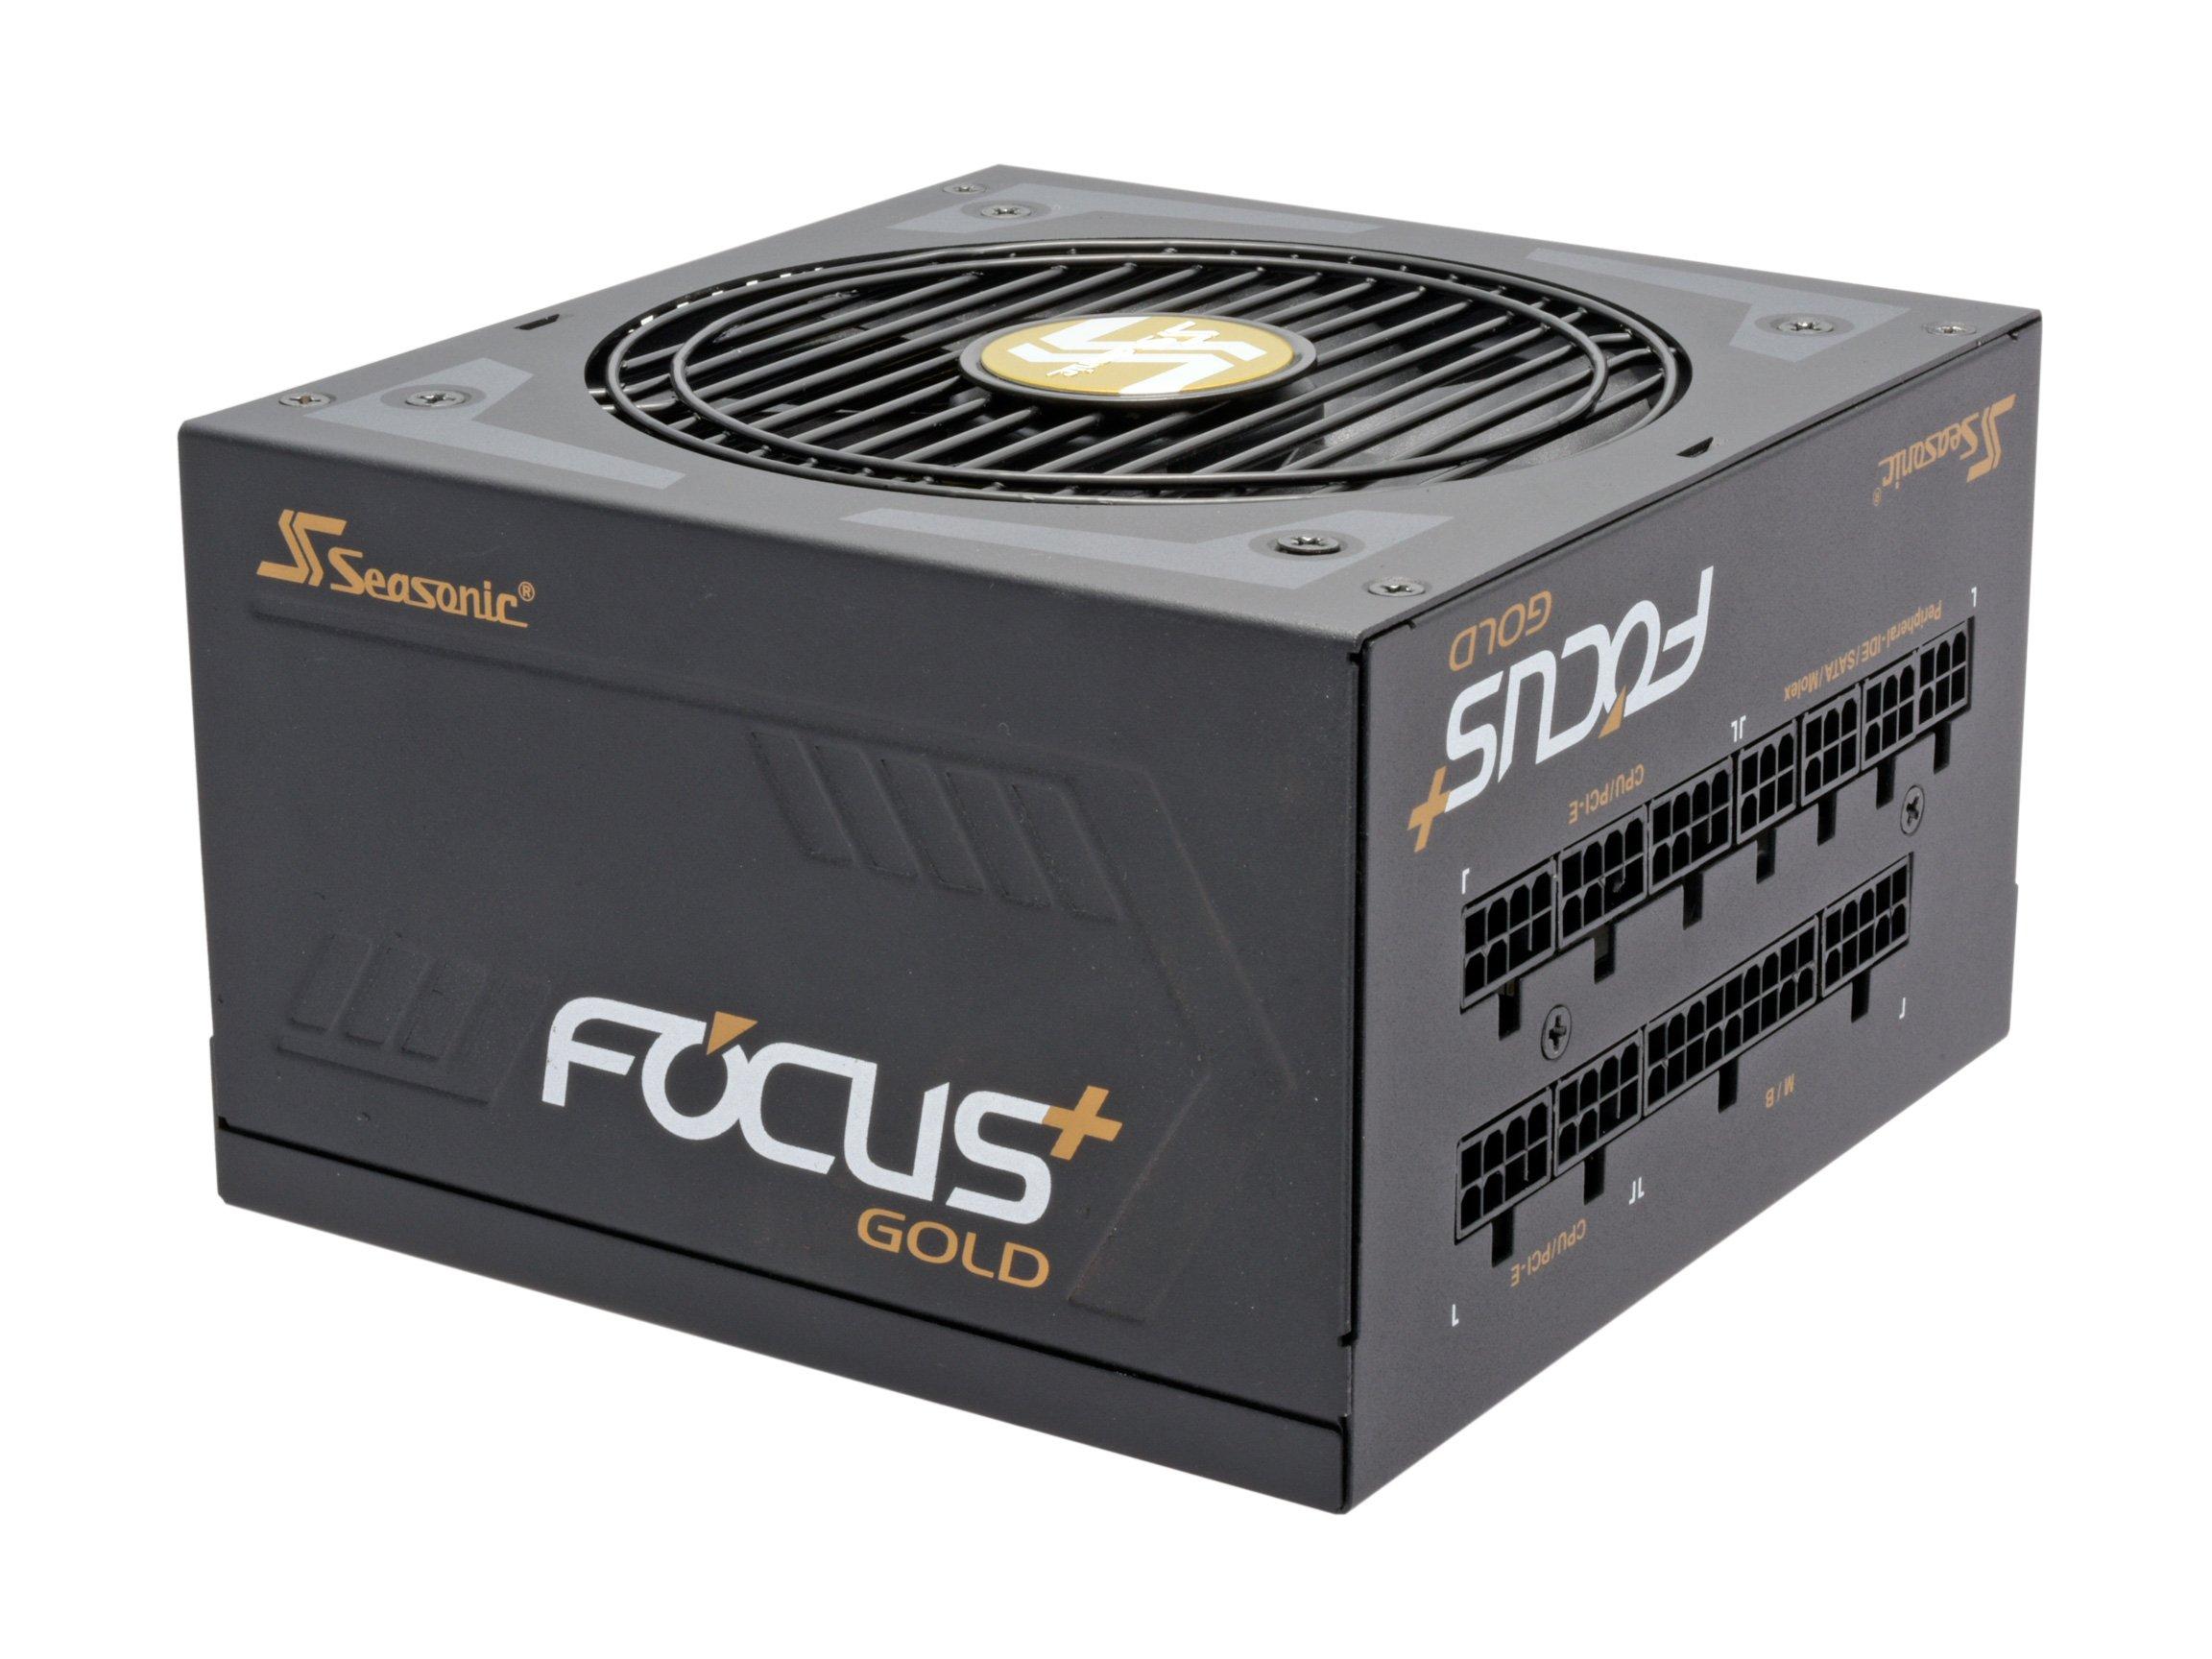 Seasonic FOCUS Plus Series SSR-750FX 750W 80+ Gold ATX12V & EPS12V Full Modular 120mm FDB Fan Compact 140 mm Size Power Supply by Seasonic (Image #1)